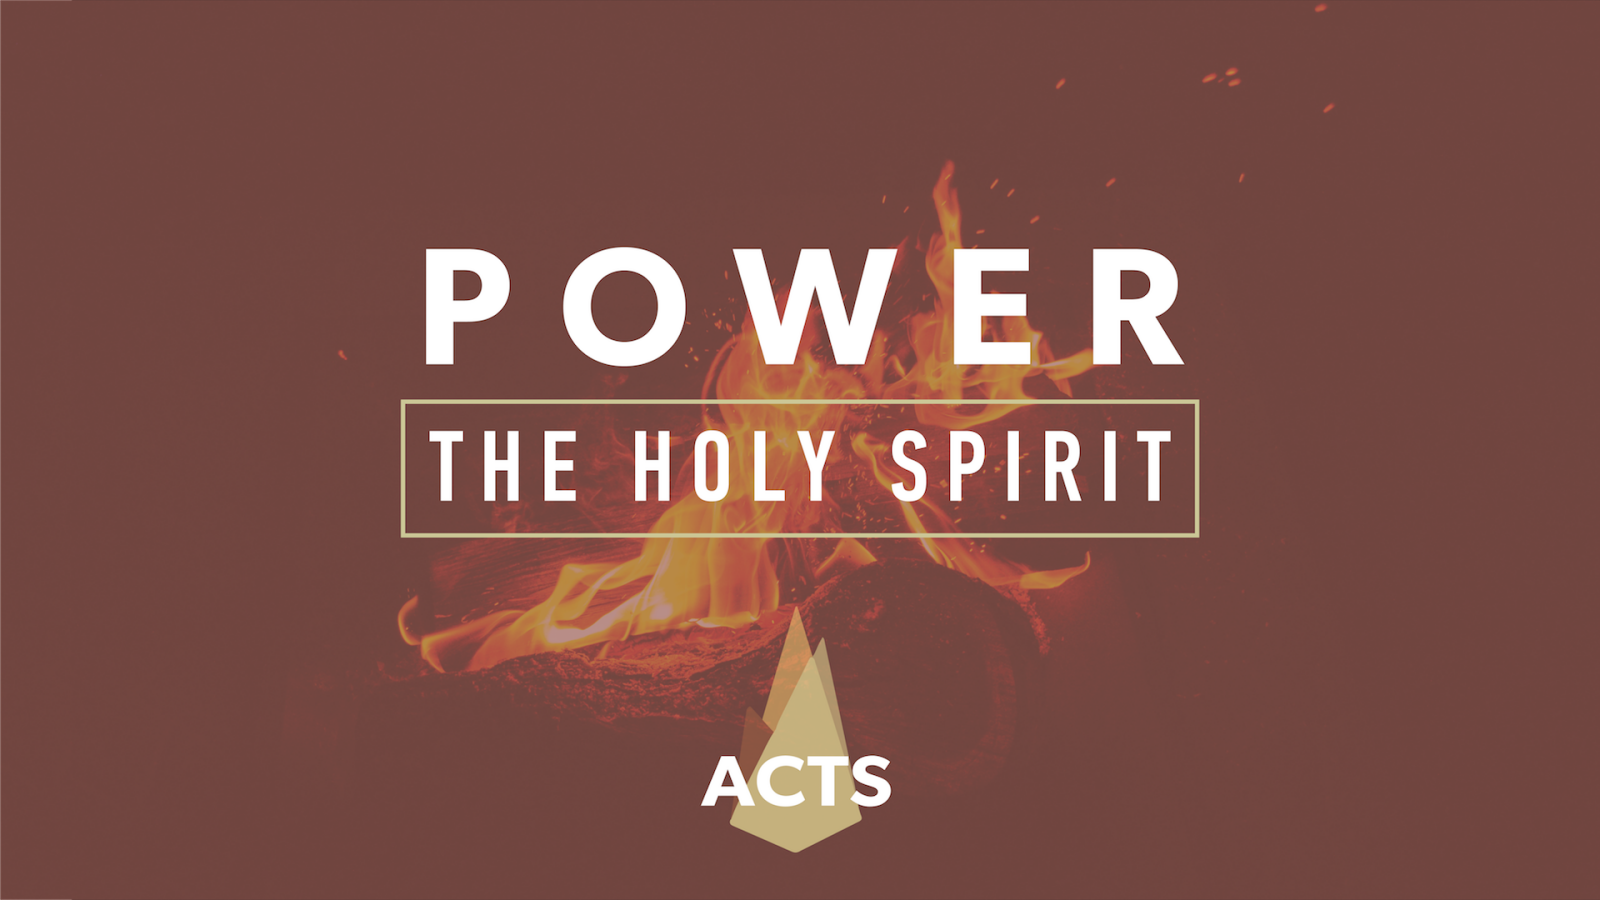 Power: The Holy Spirit